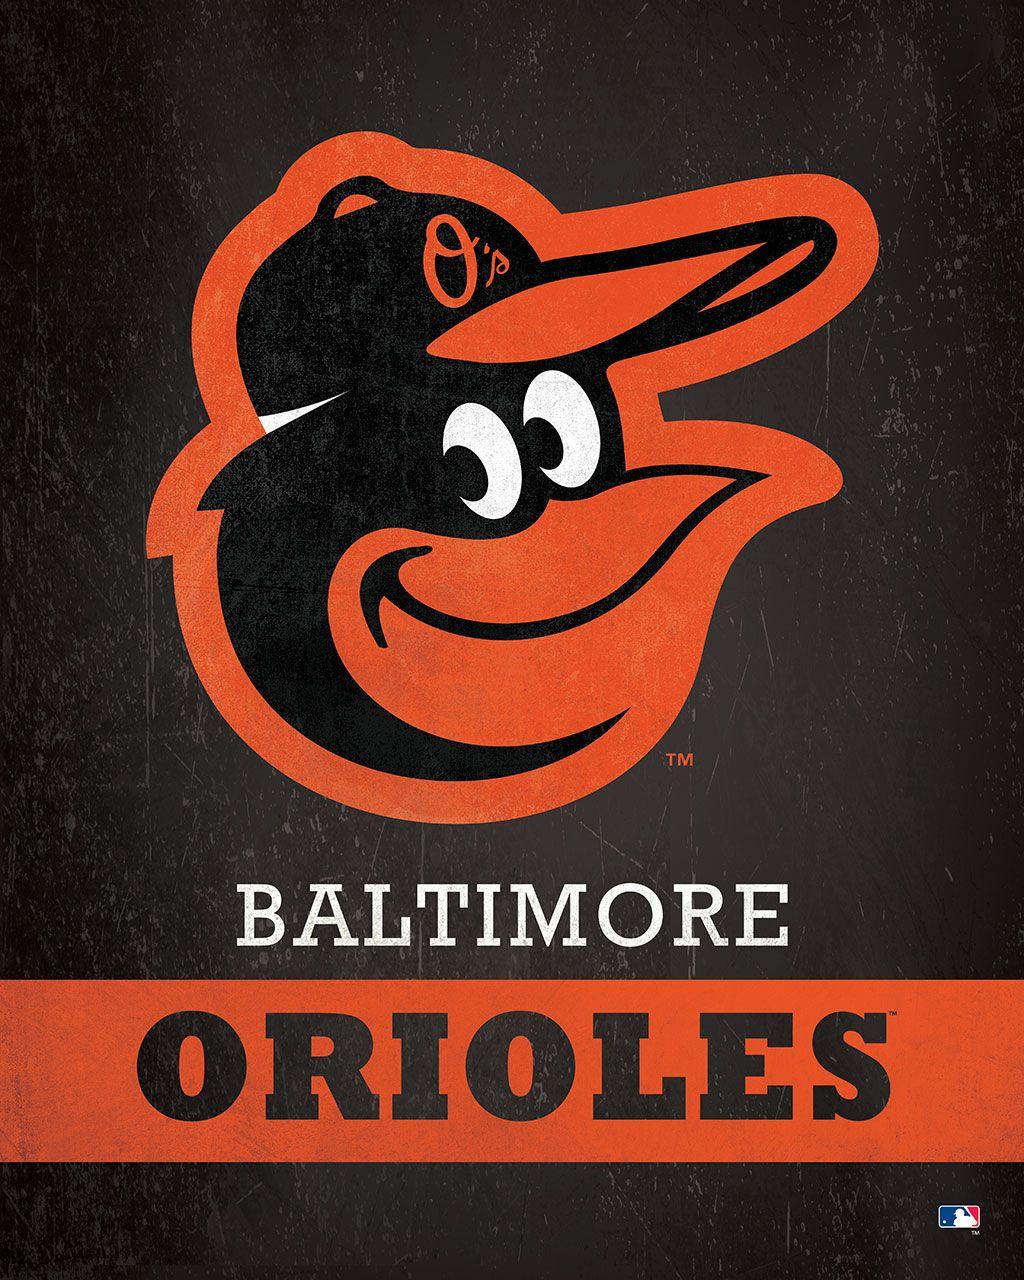 Baltimore orioles logo 2499 orioles logo baltimore